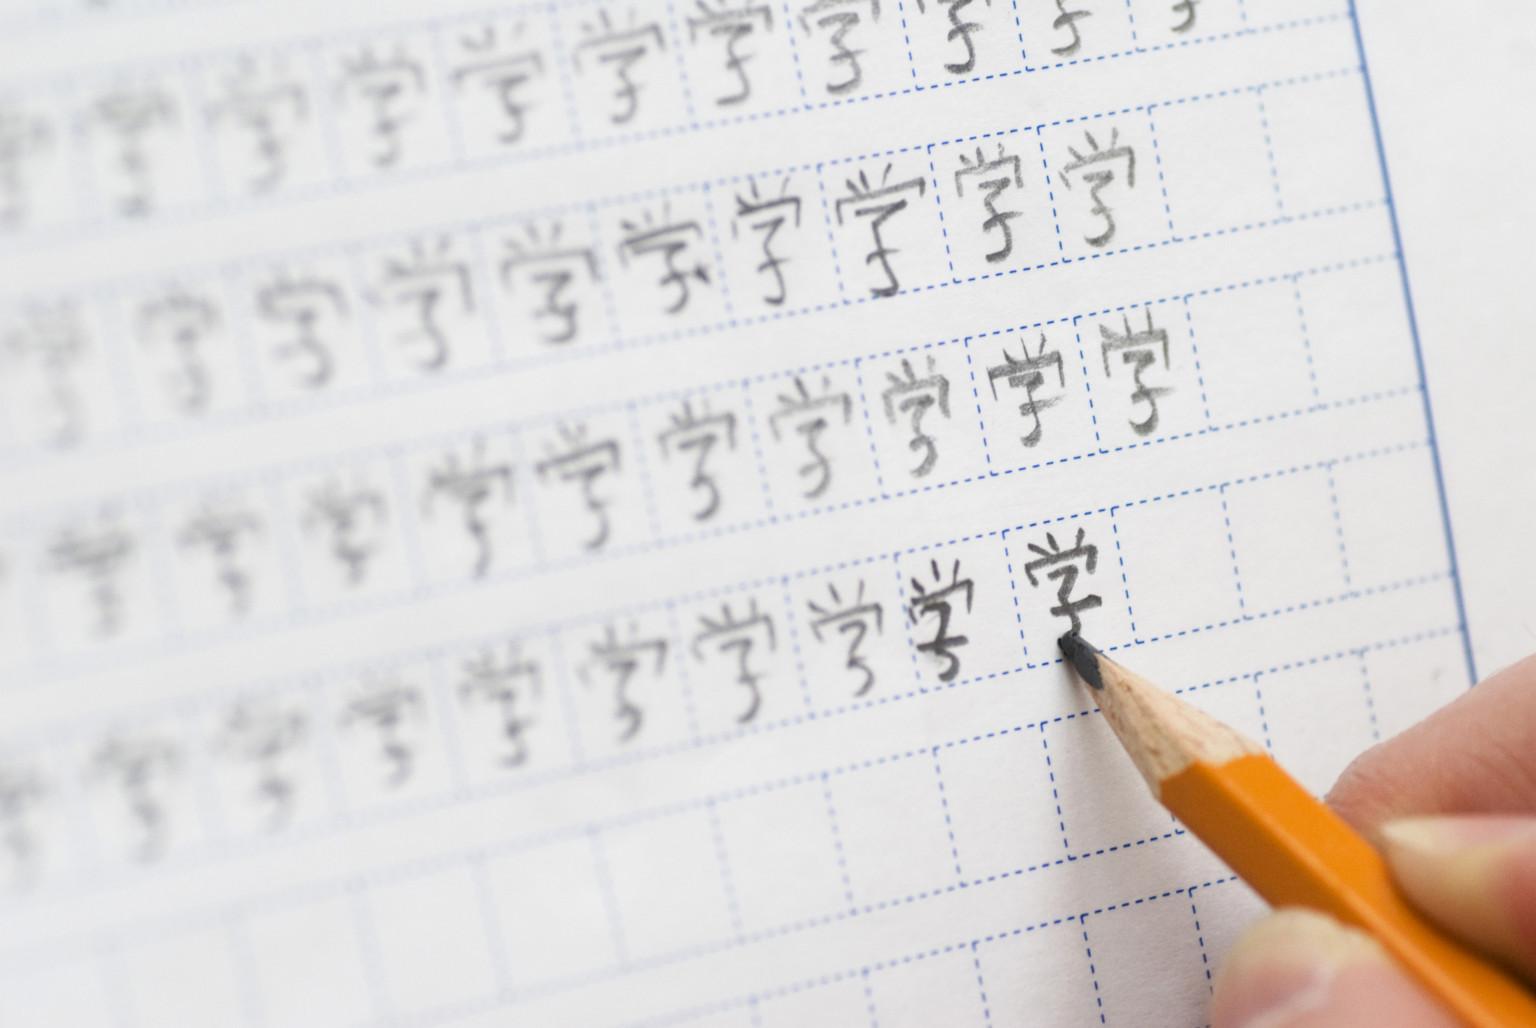 China Says 400 Million Can T Speak National Language As